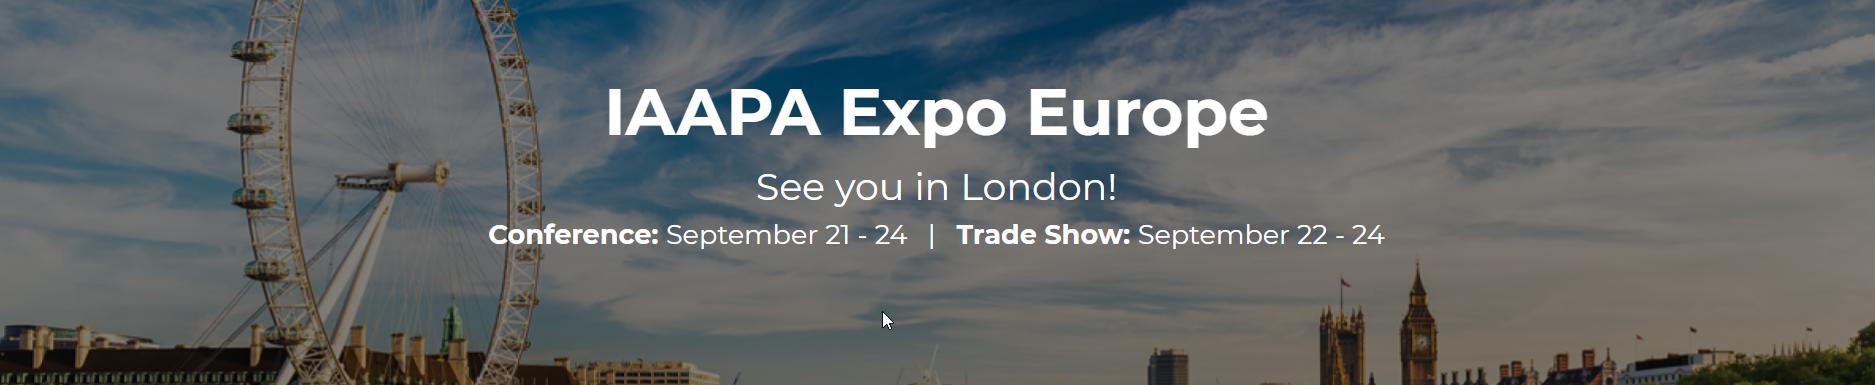 IAAPA EXPO London 2020